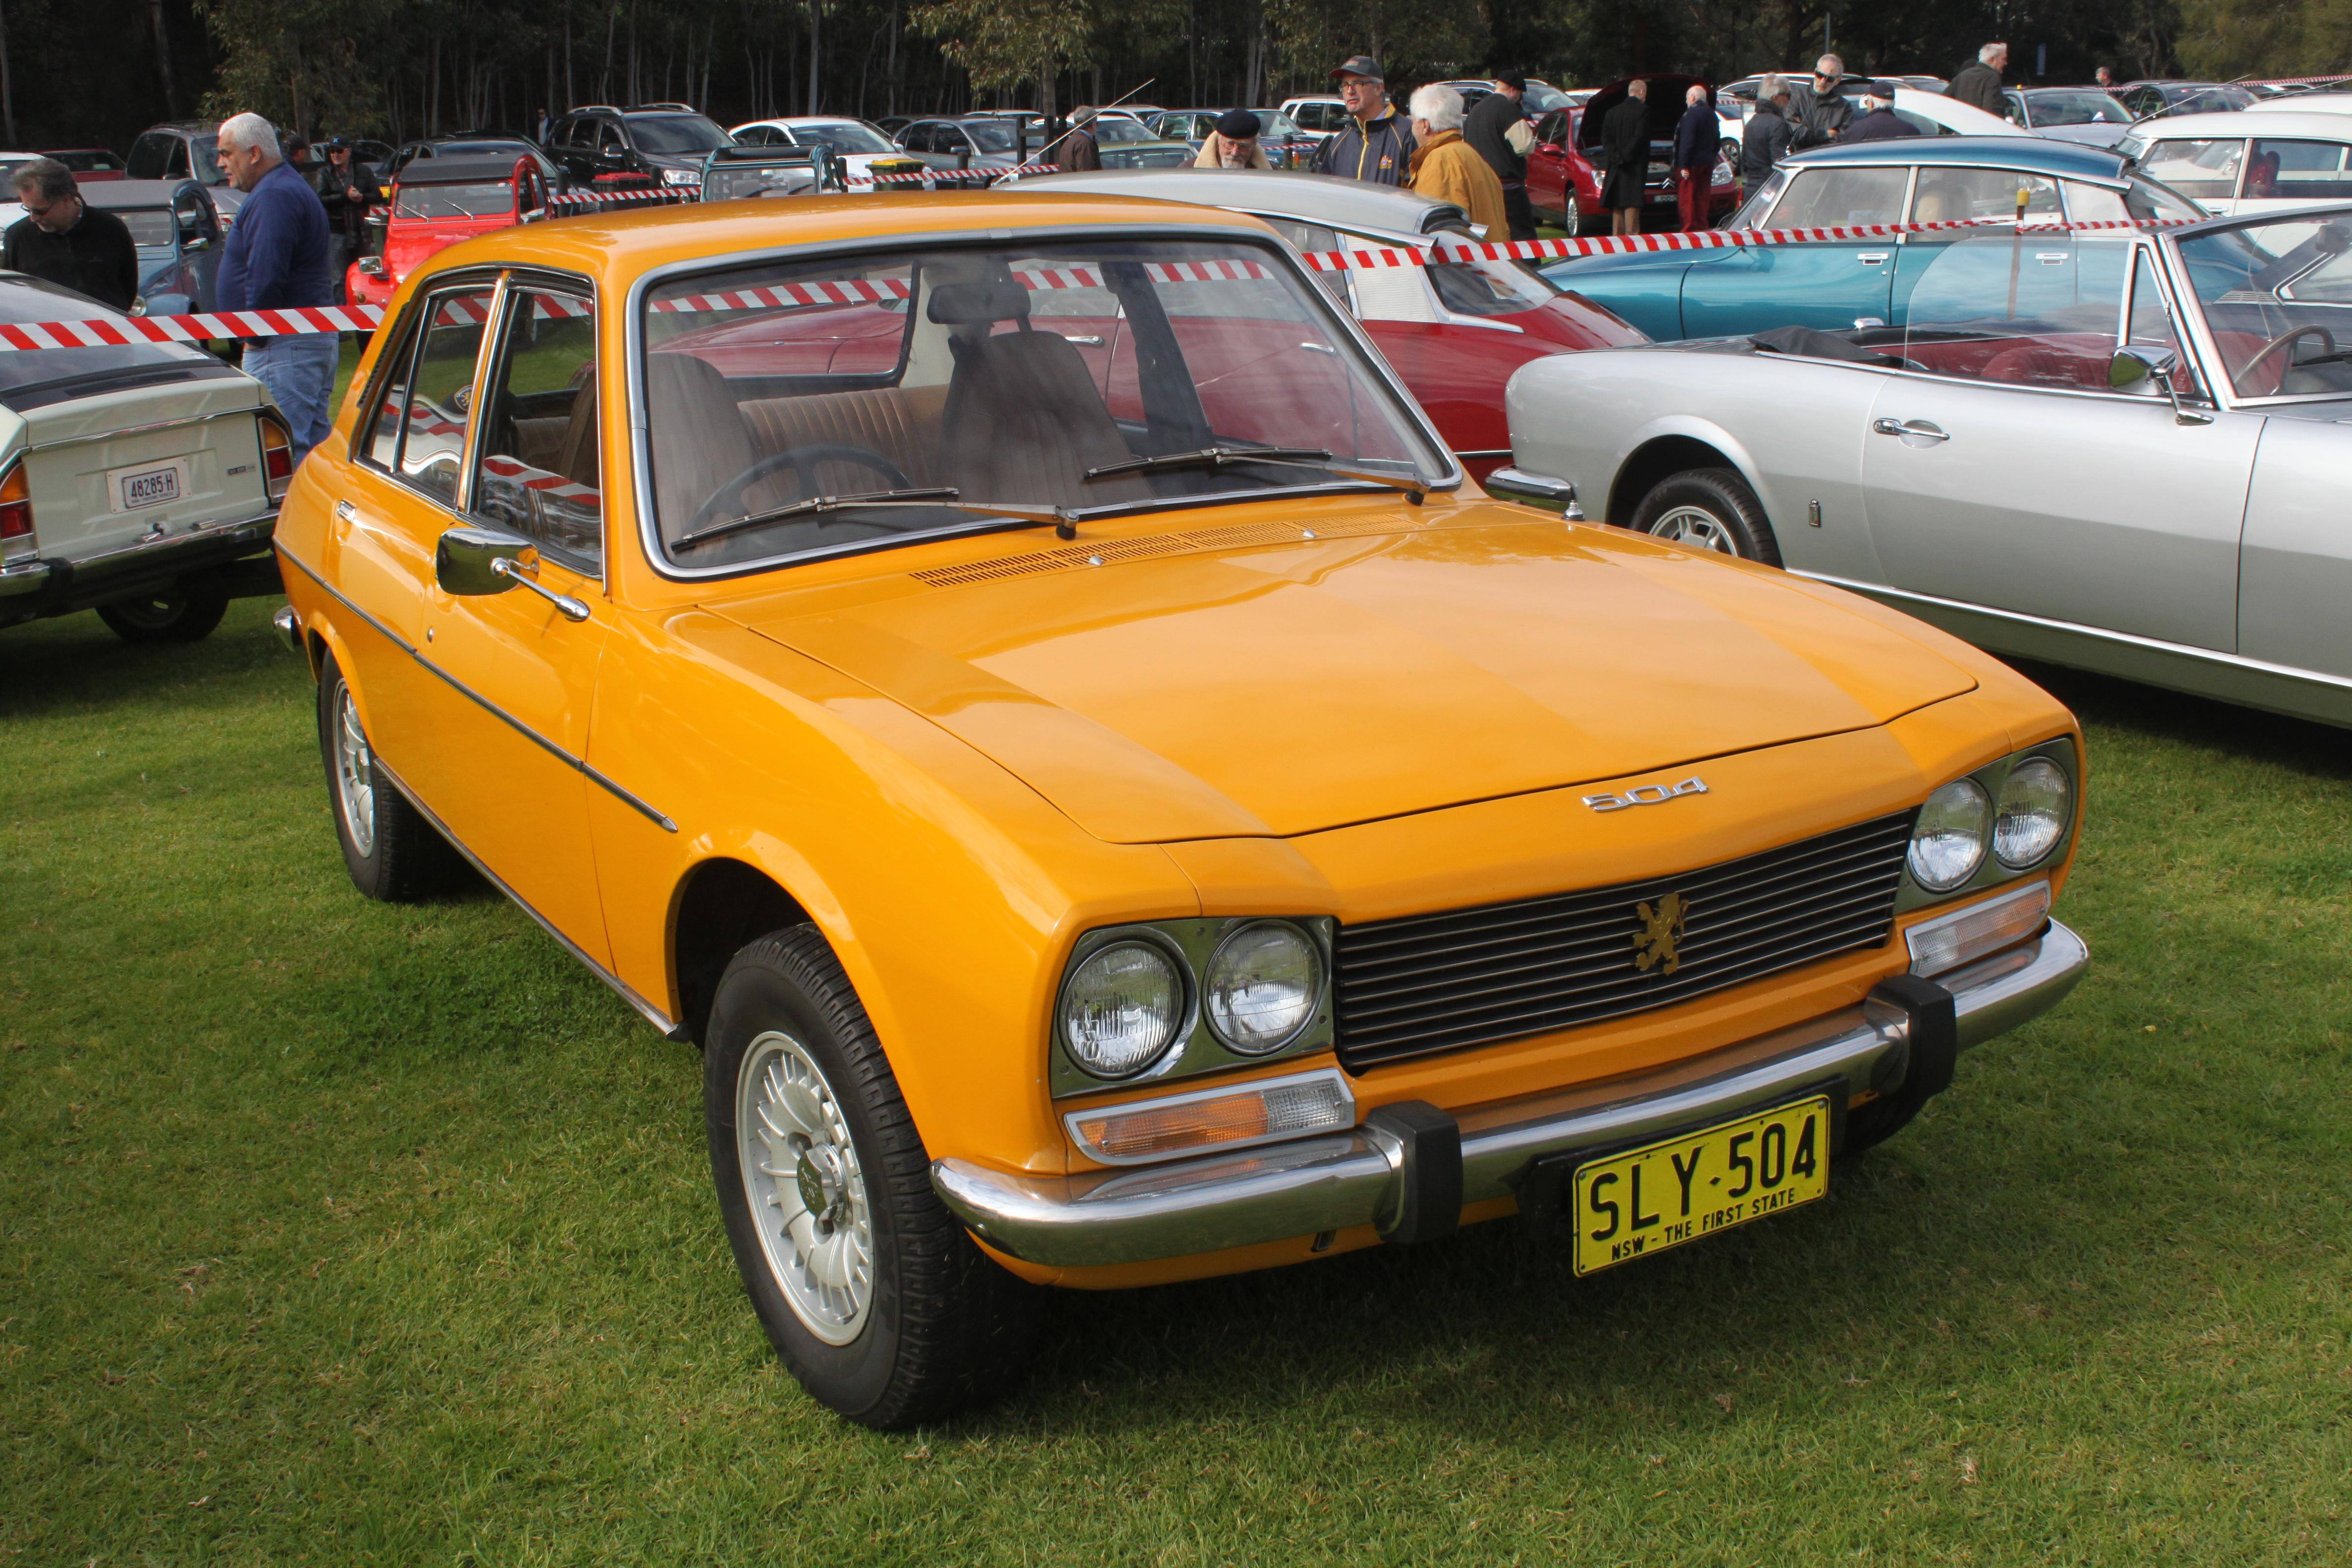 file:1975 peugeot 504 gl sedan (19774602361) - wikimedia commons